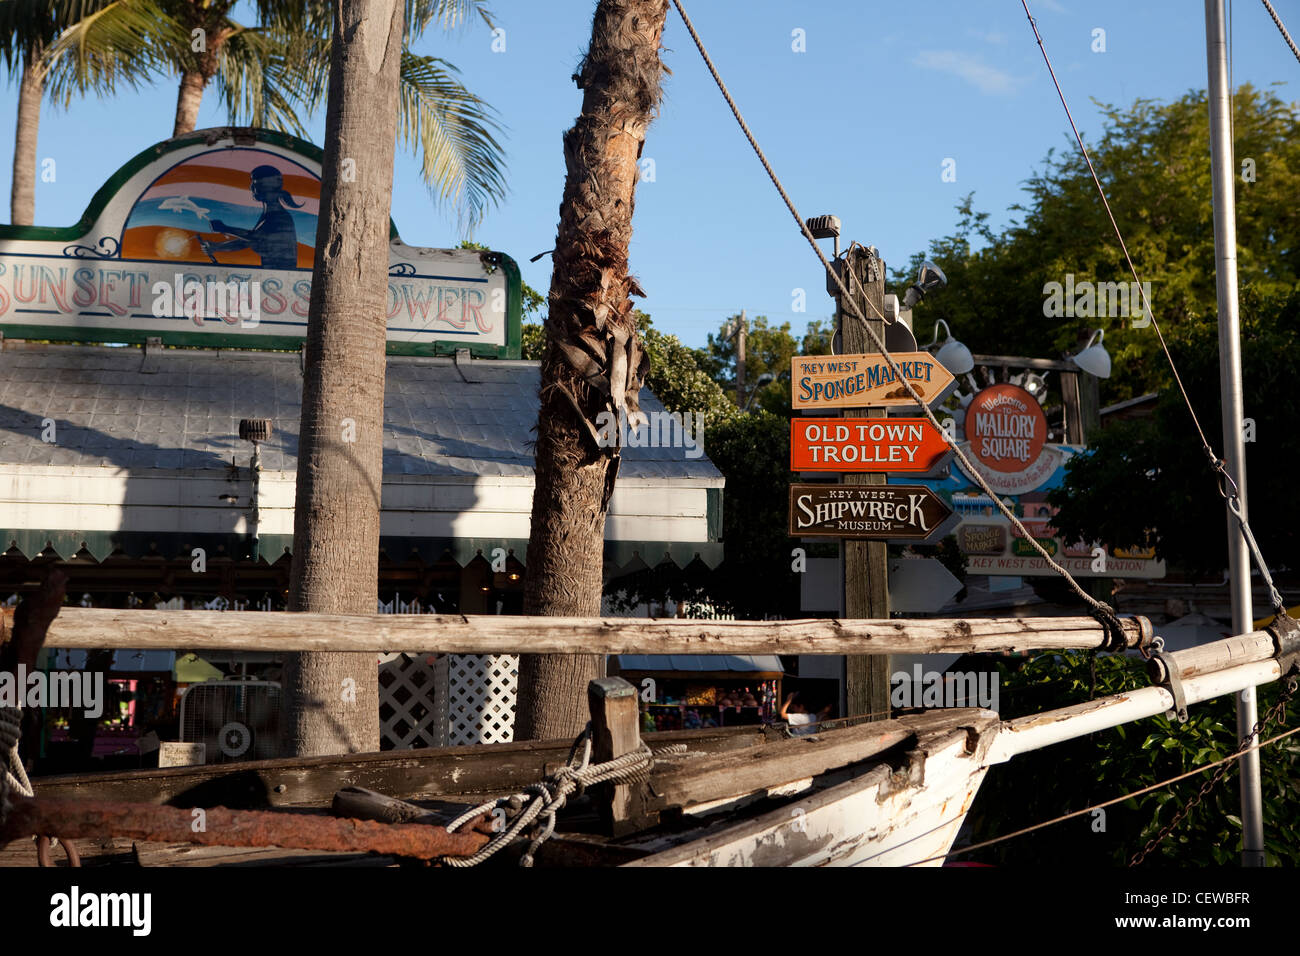 Mallory square, Key West, USA - Stock Image